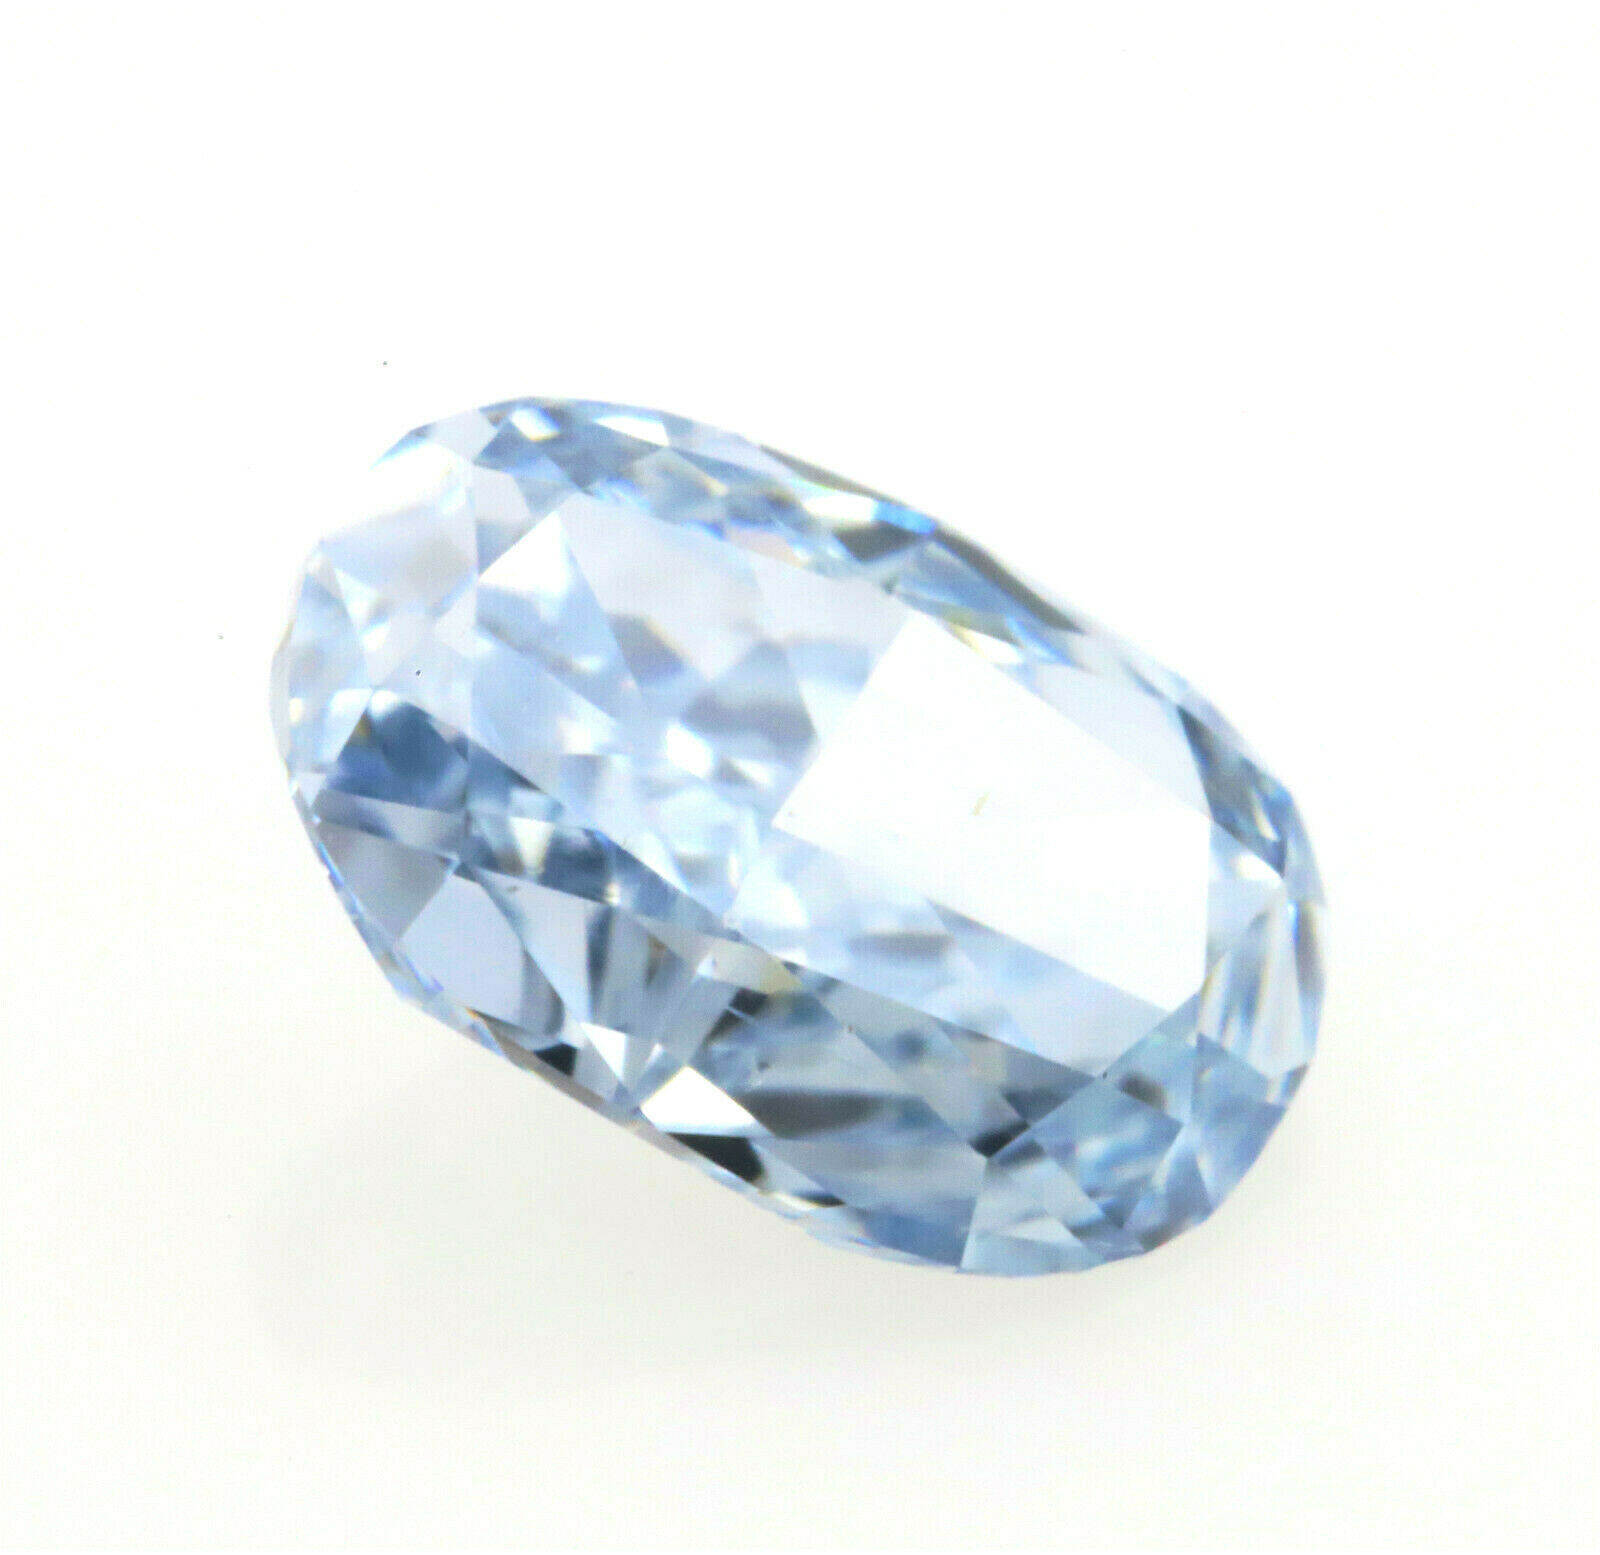 Type Llb Blue Diamond 0 16ct Natural Loose Fancy Intense